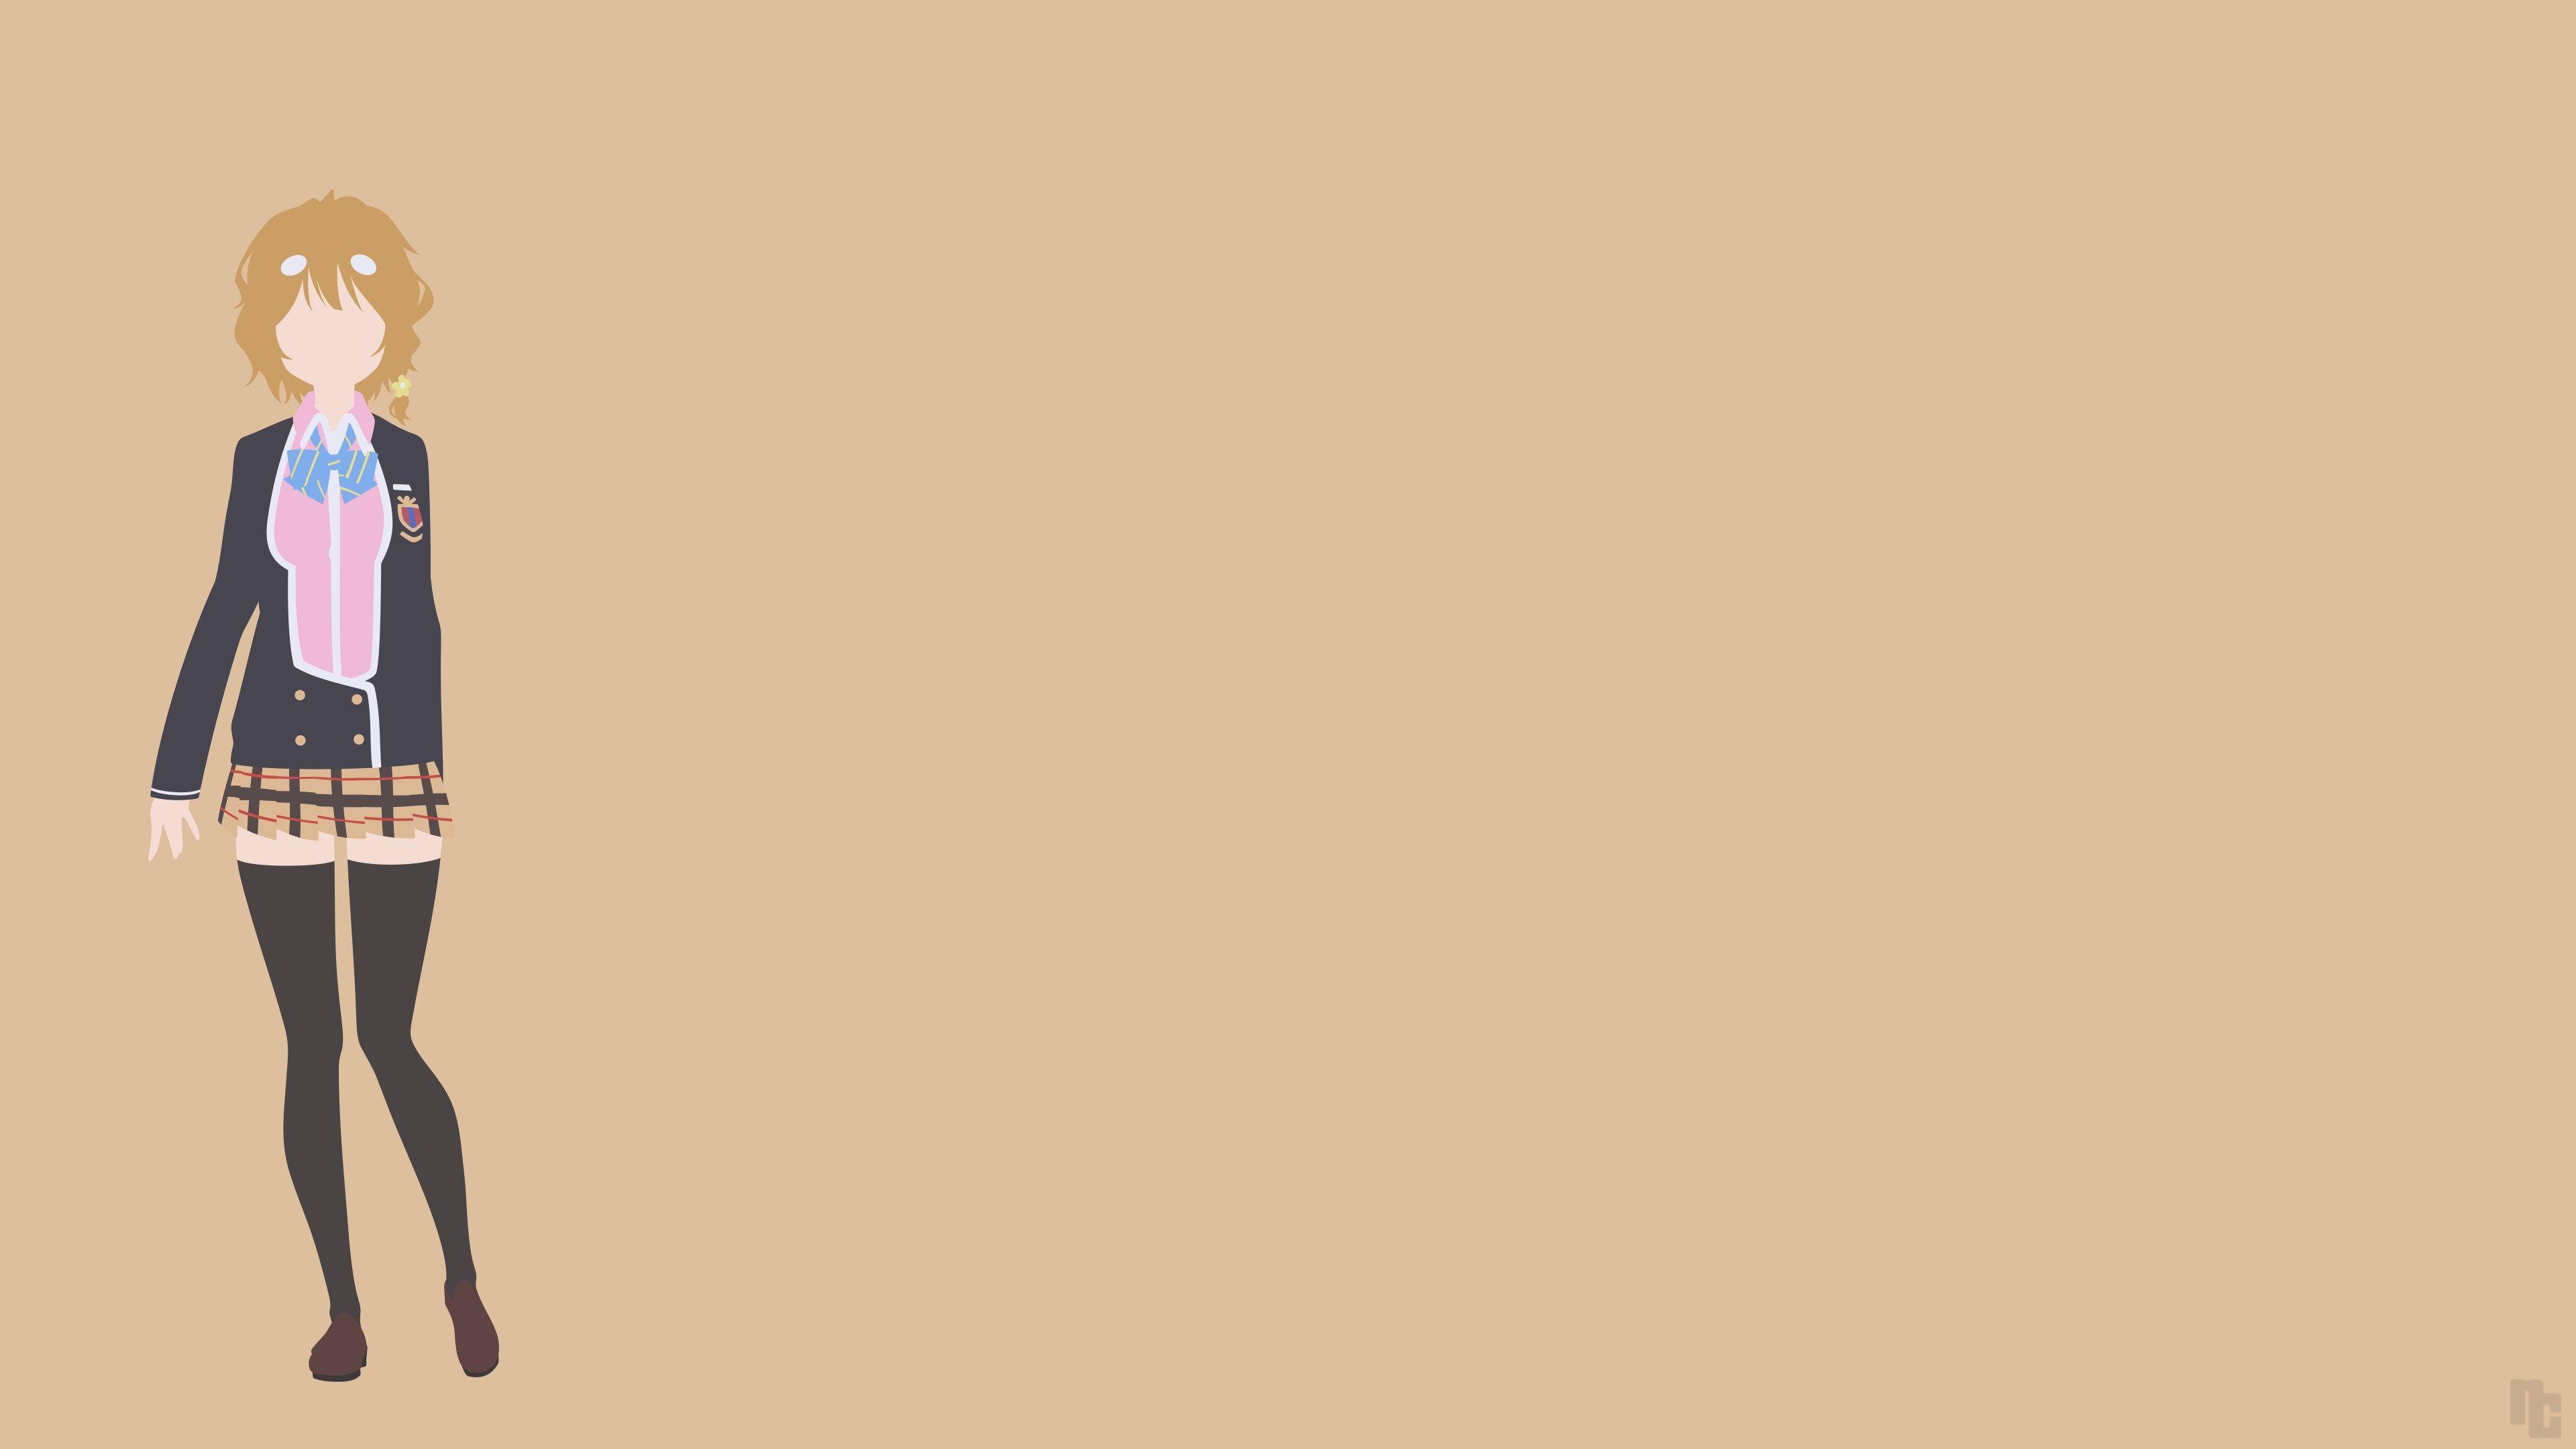 4k masamune kuns revenge hd wallpaper 3840x2160 wallpaper editorminimalist wallpaperfree desktop